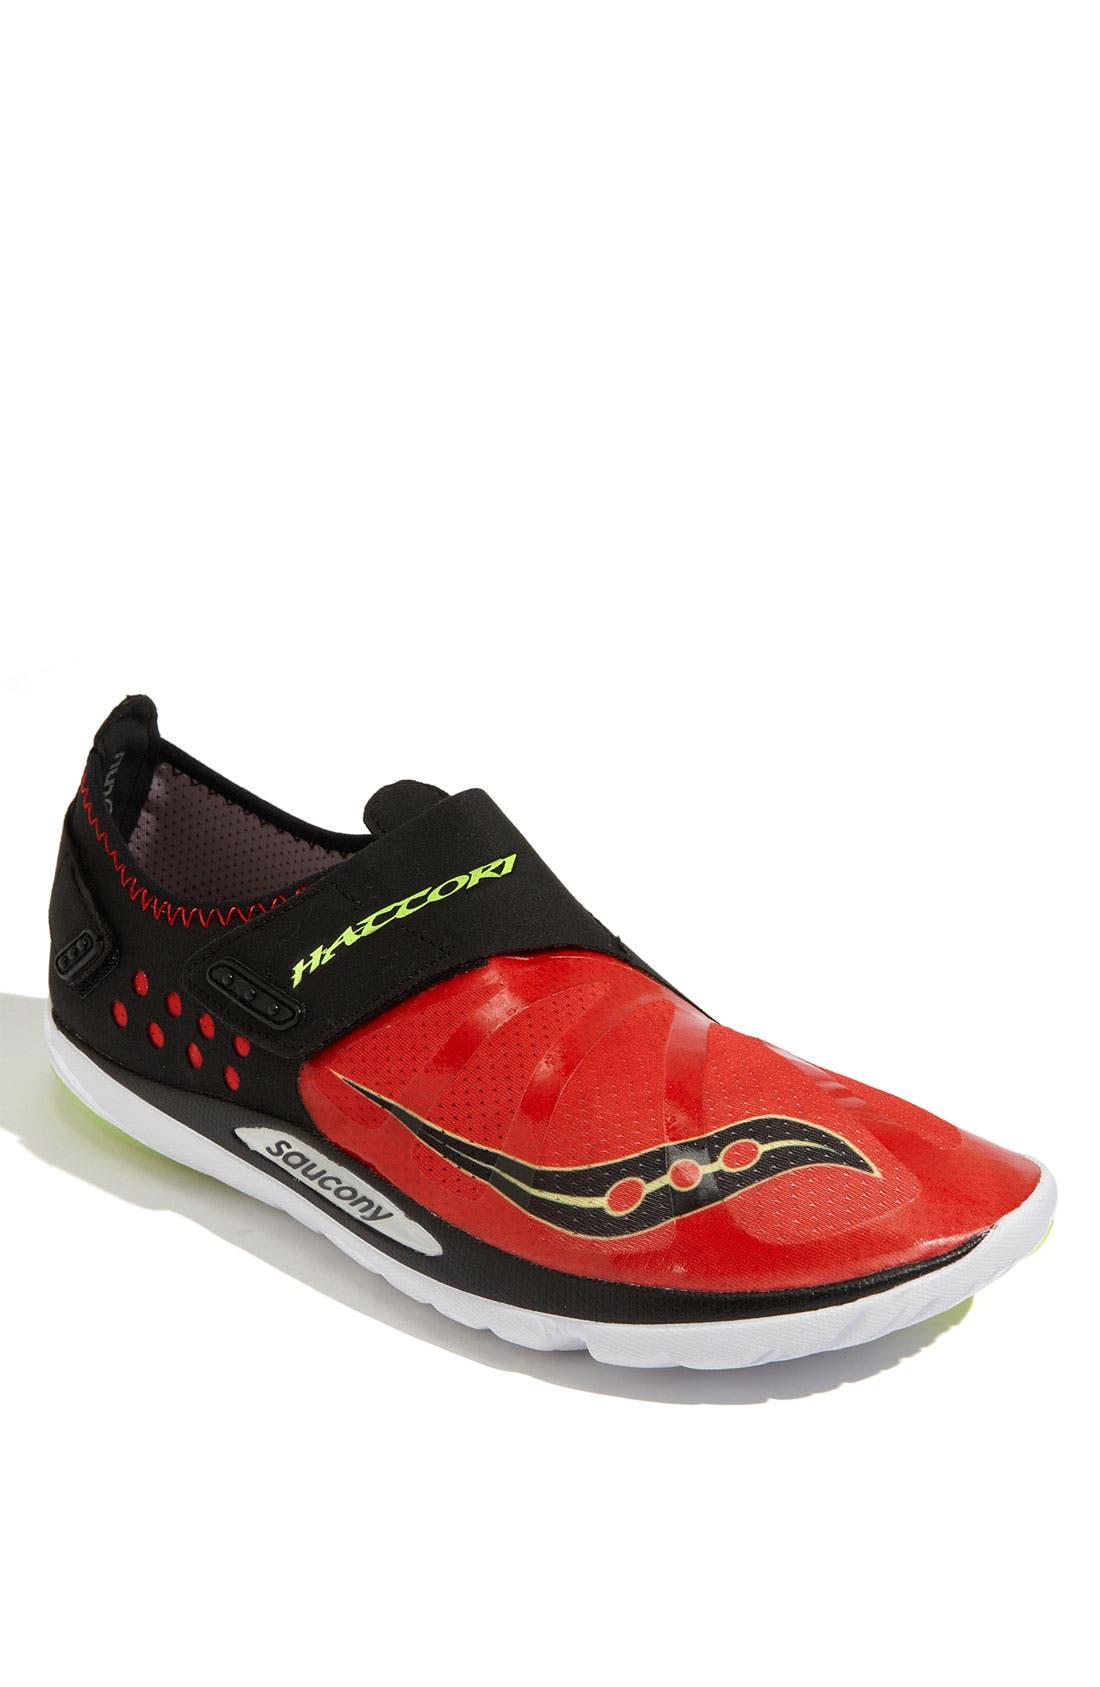 Alternate Image 1 Selected - Saucony 'Hattori' Running Shoe (Men)